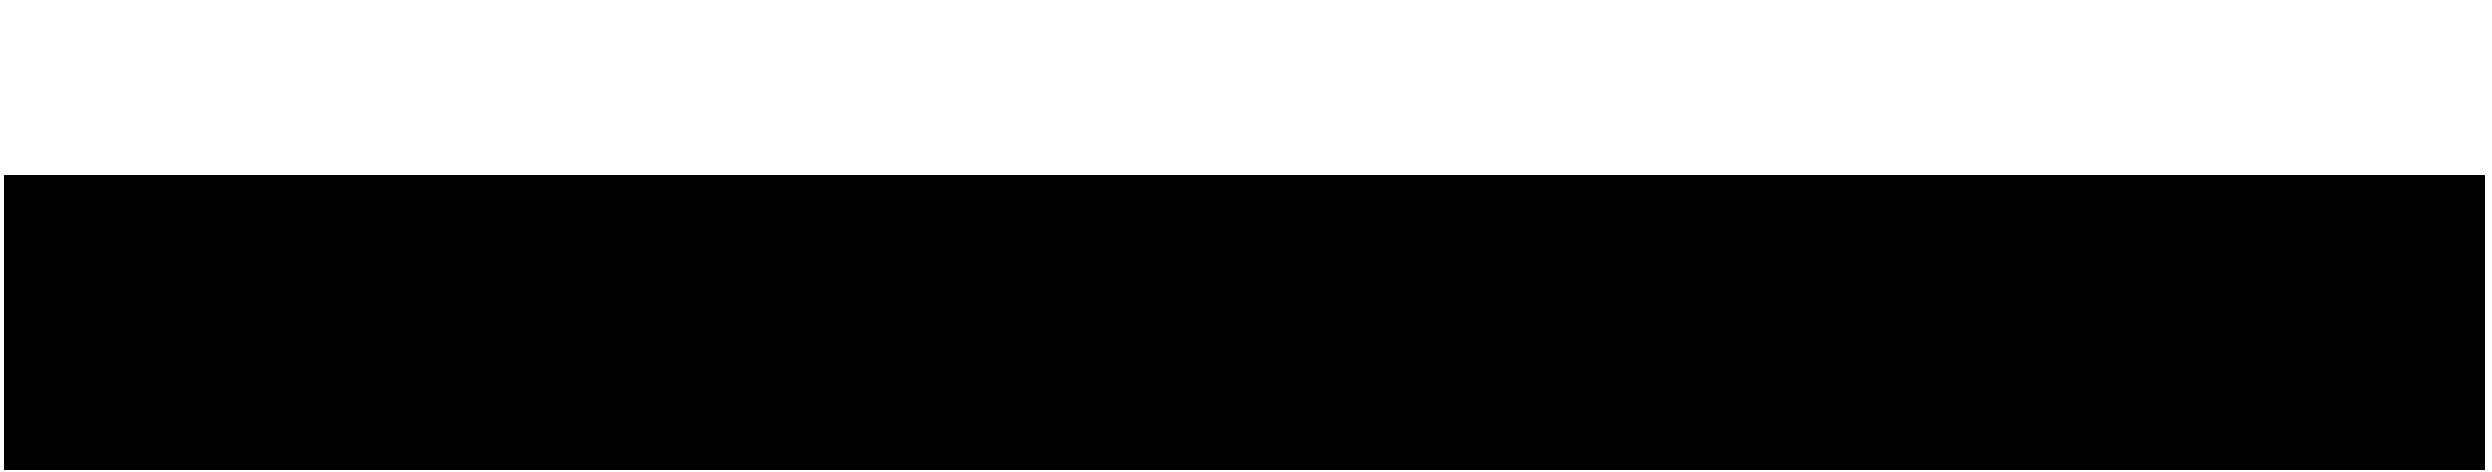 logo-toni-guy-lfw-1b39c7994a-1_hoch-1.png